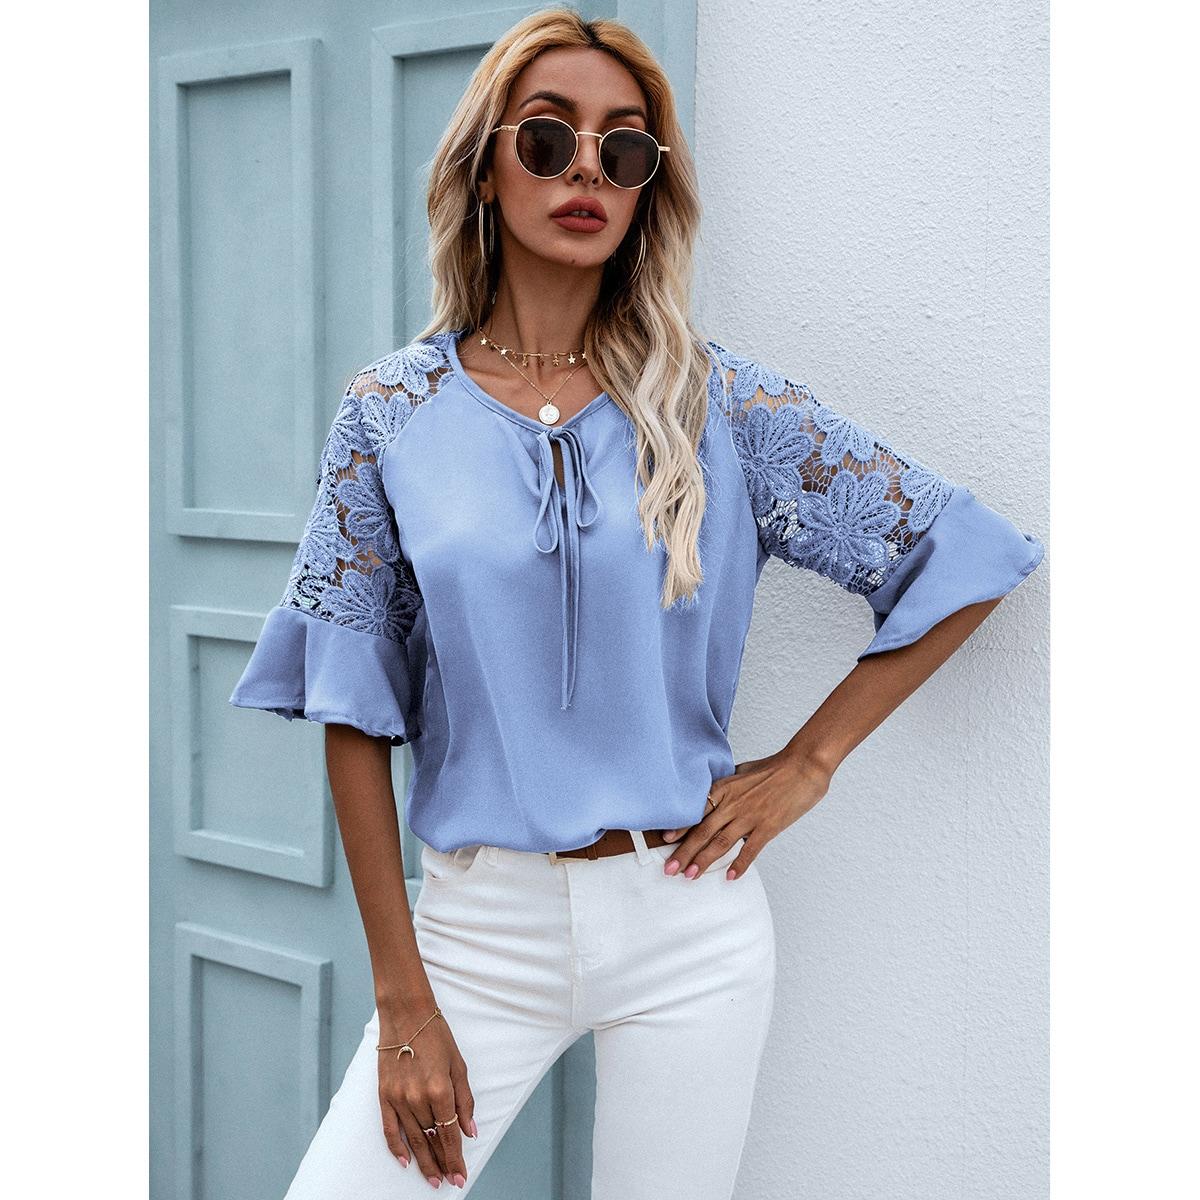 Блуза из гипюра с кружевом SheIn swblouse23210415824